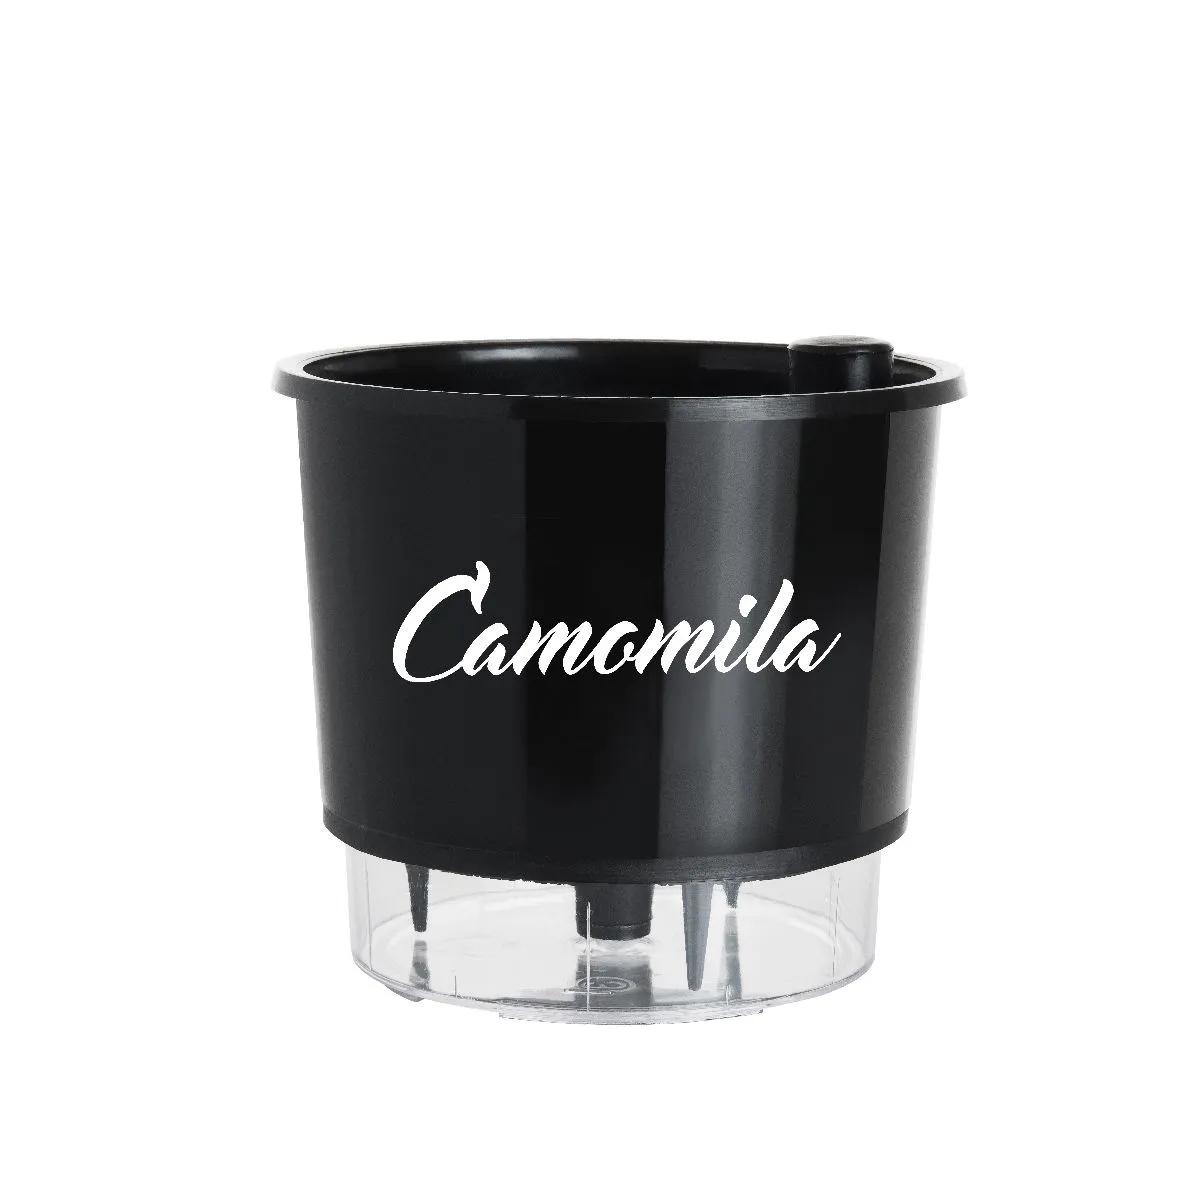 Vaso Autoirrigável Médio Preto Coleção Gourmet 16cm x 14cm Camomila  - Vasos Raiz Loja Oficial